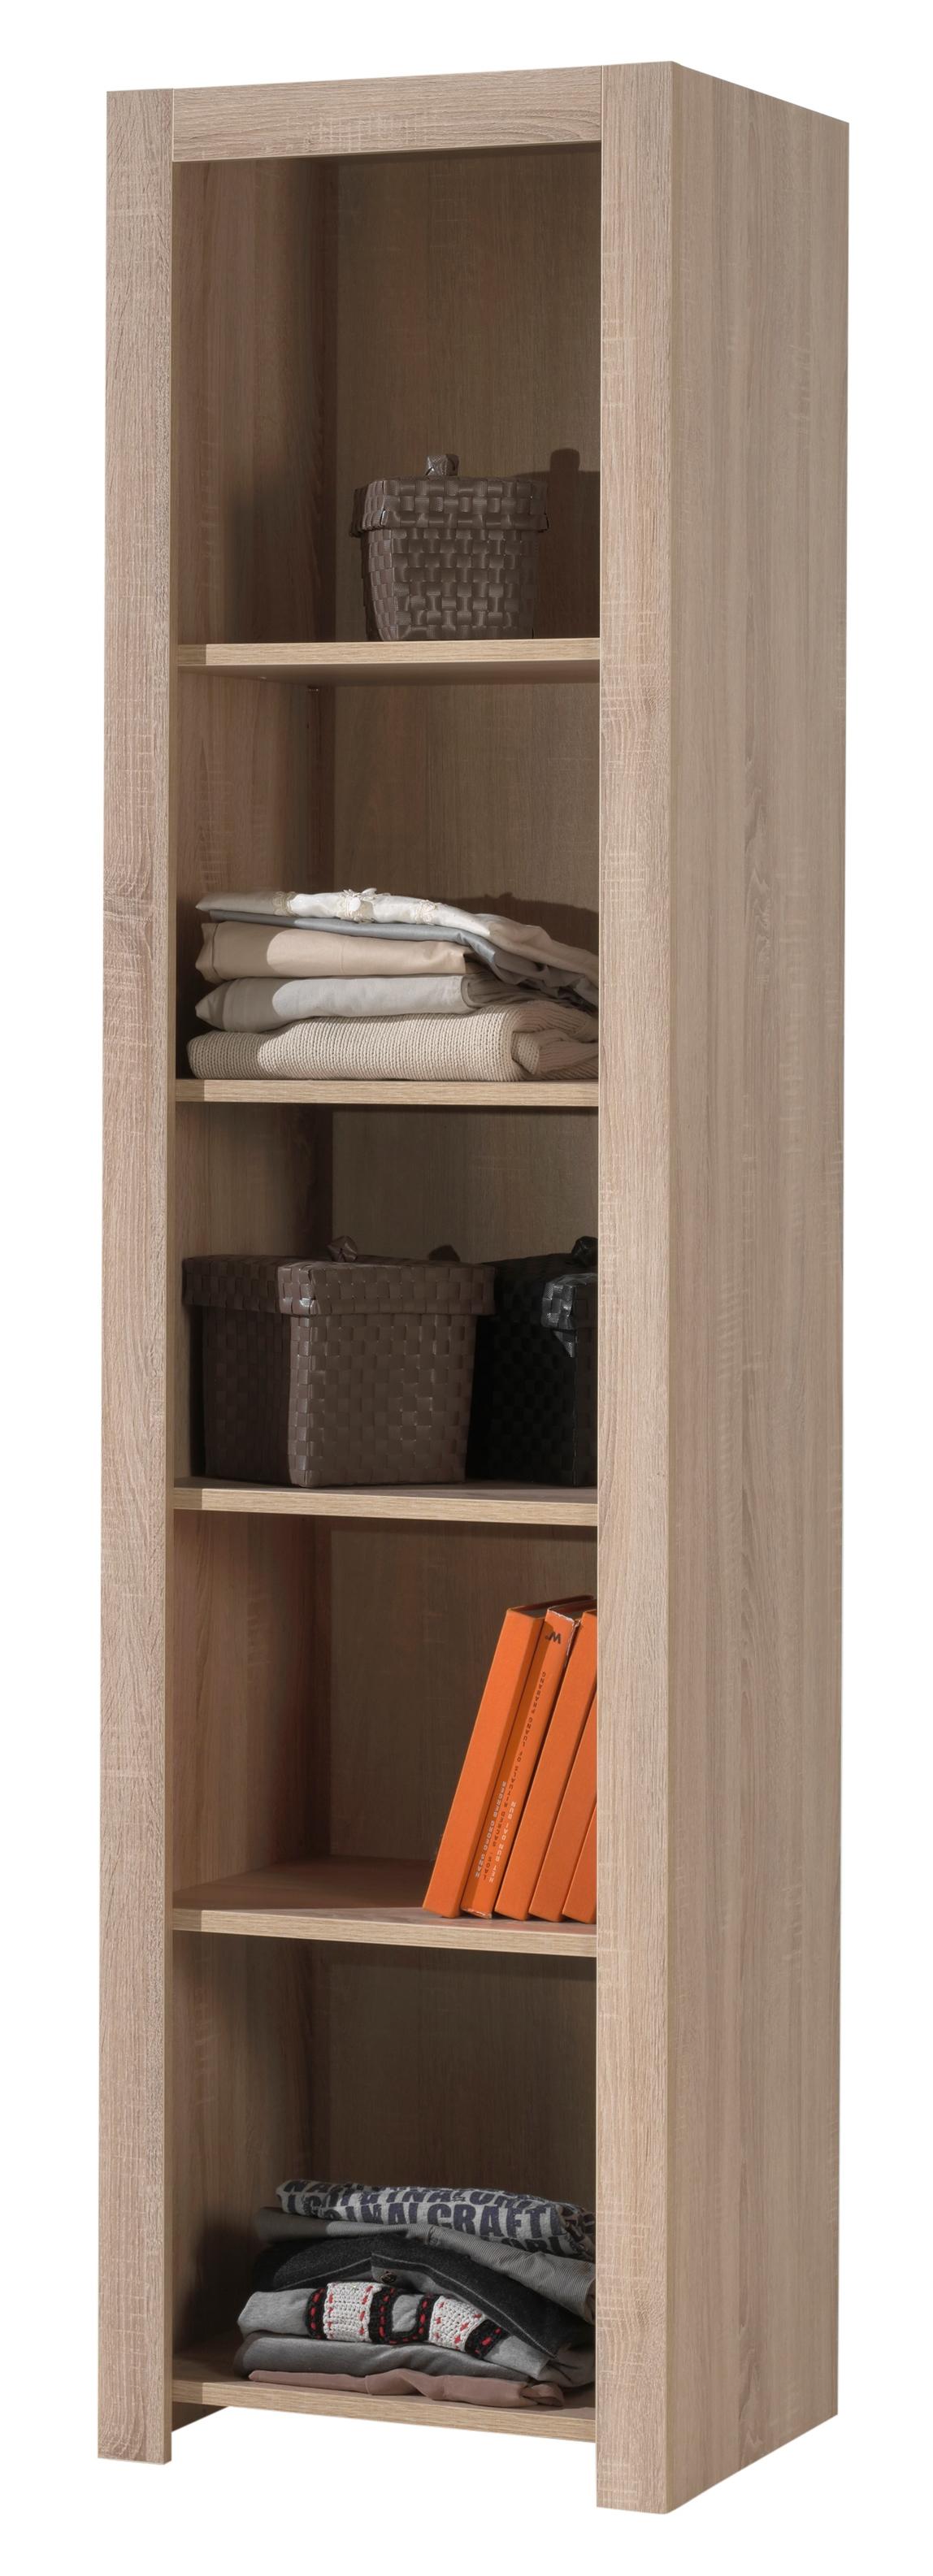 biblioth que bois ch ne clair campus. Black Bedroom Furniture Sets. Home Design Ideas